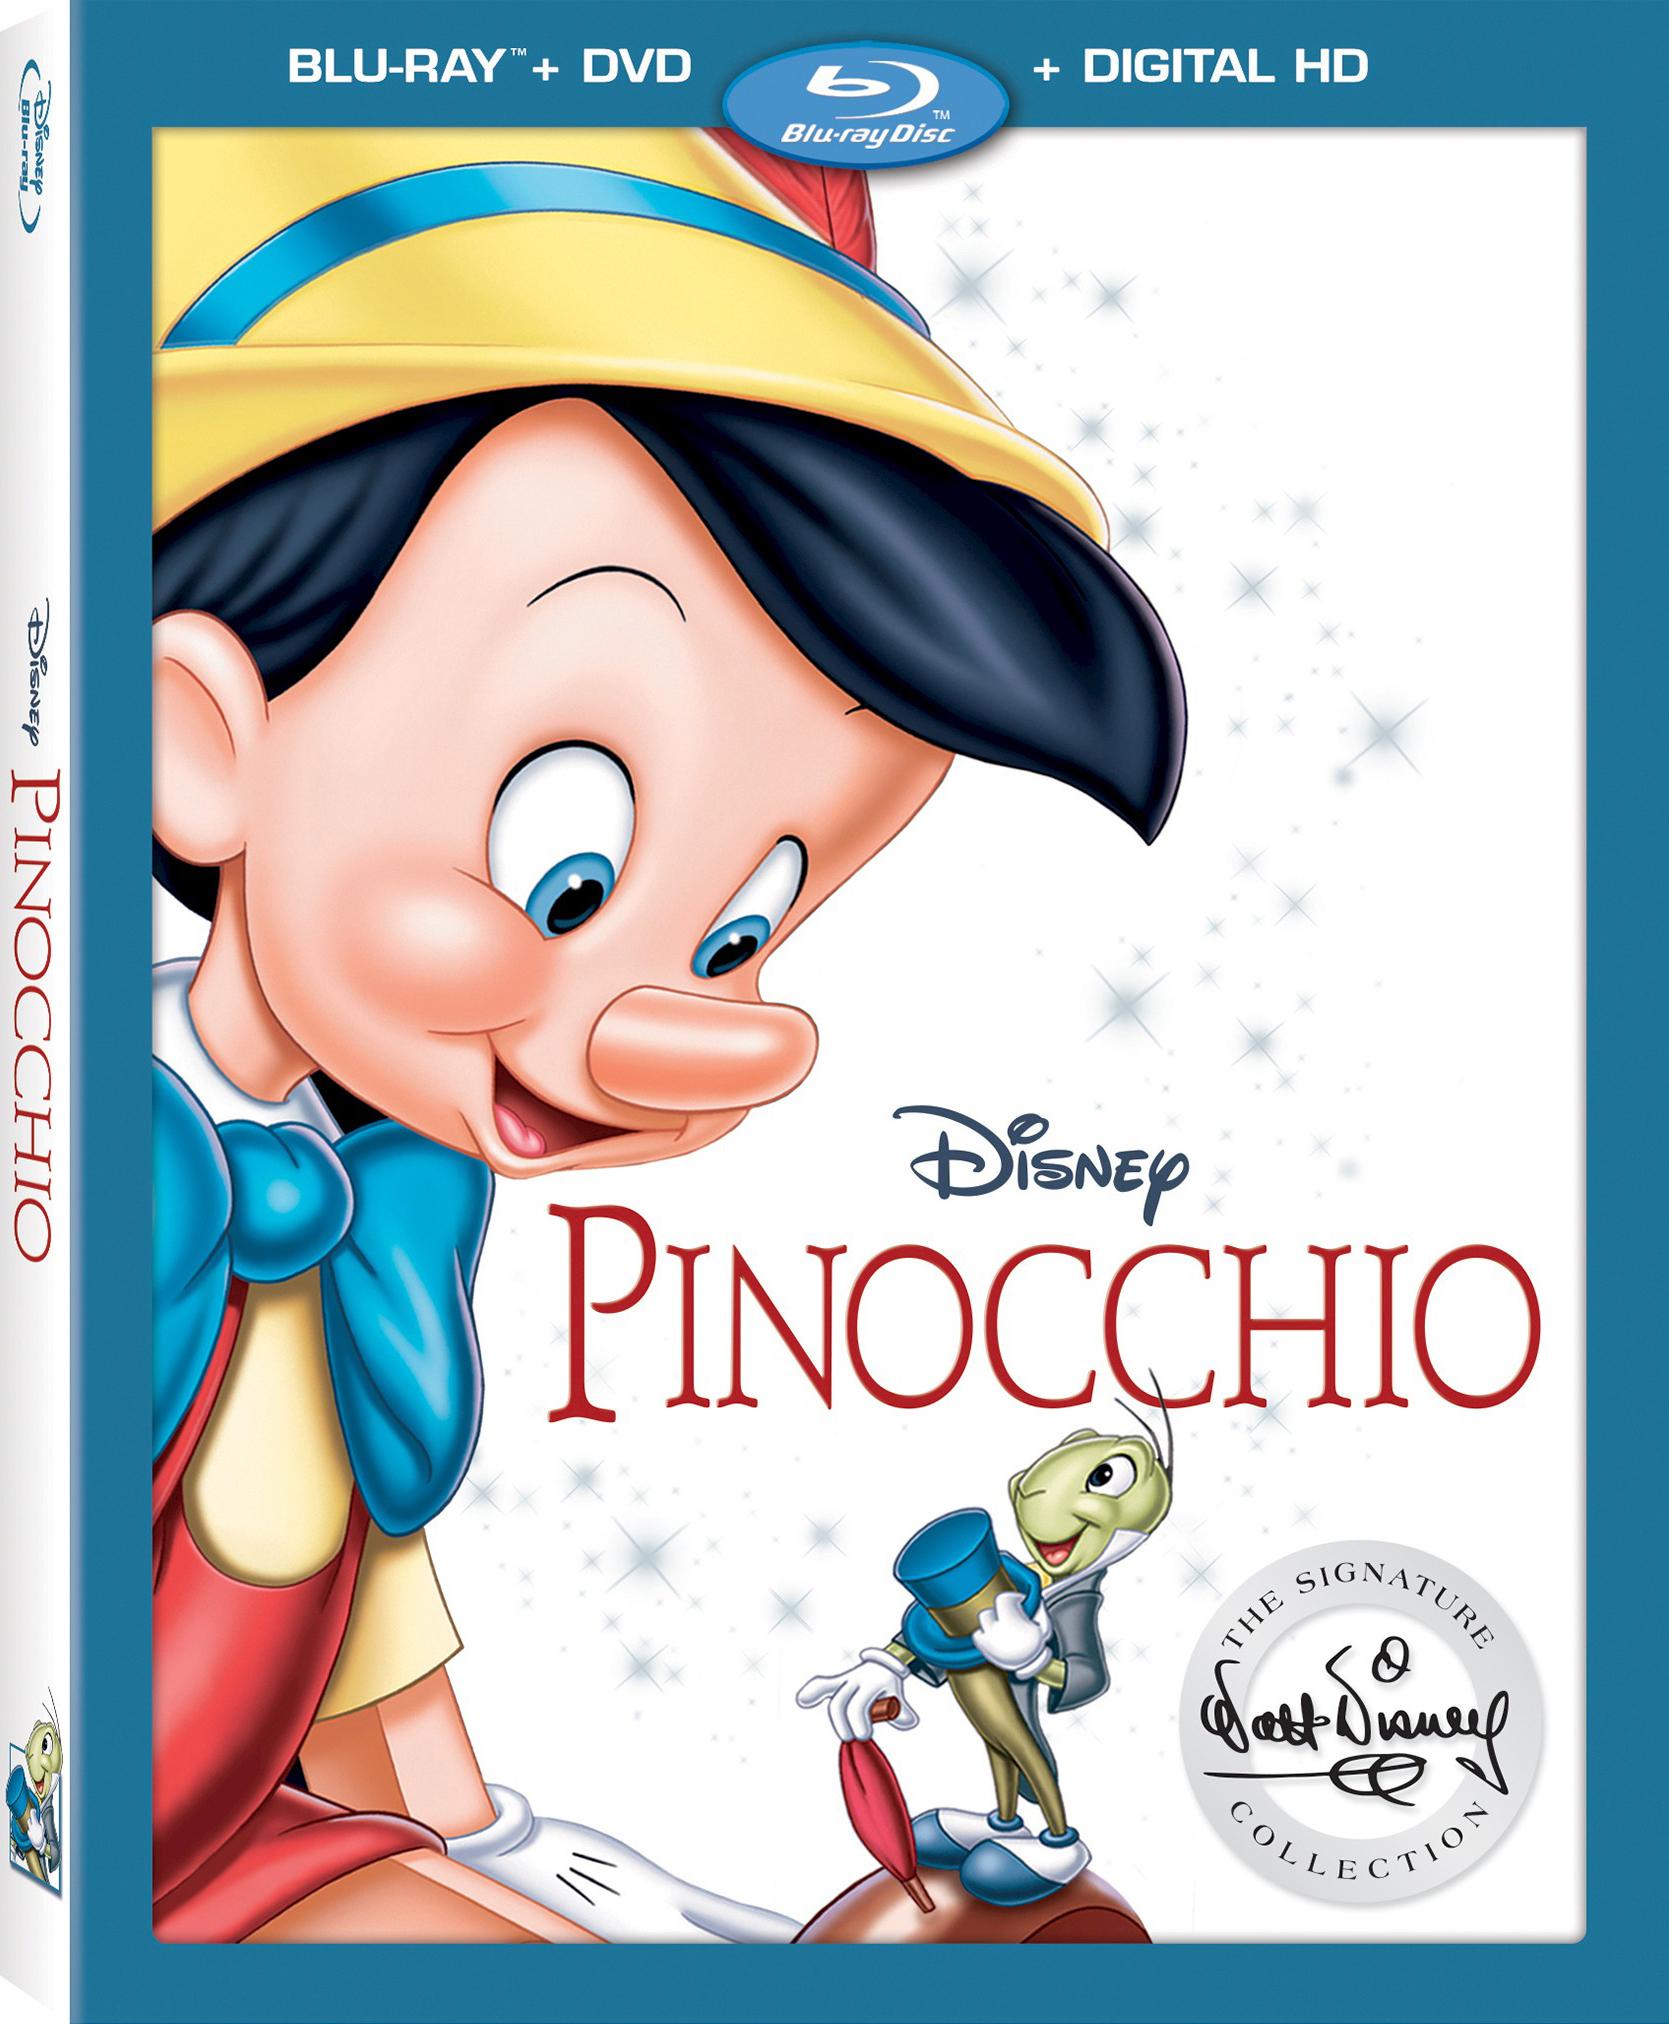 [Image: Pinocchio.jpg]